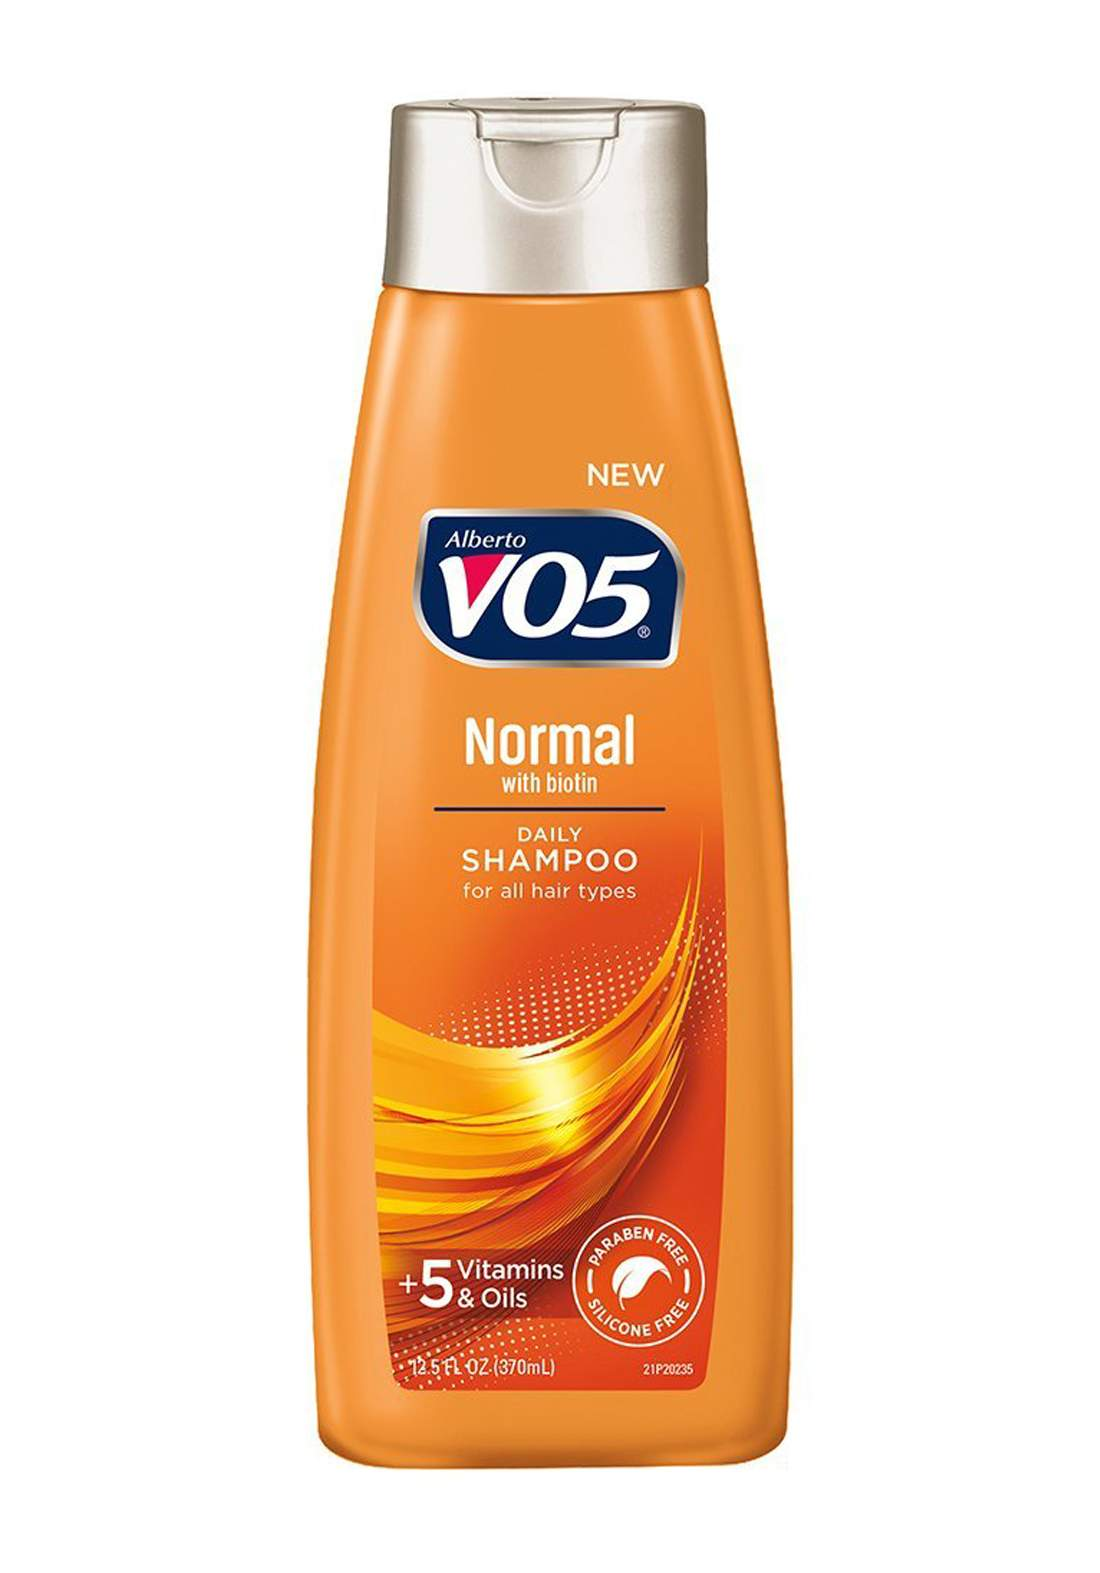 VO5 Normal With Biotin Daily Shampoo 370ml شامبو للشعر